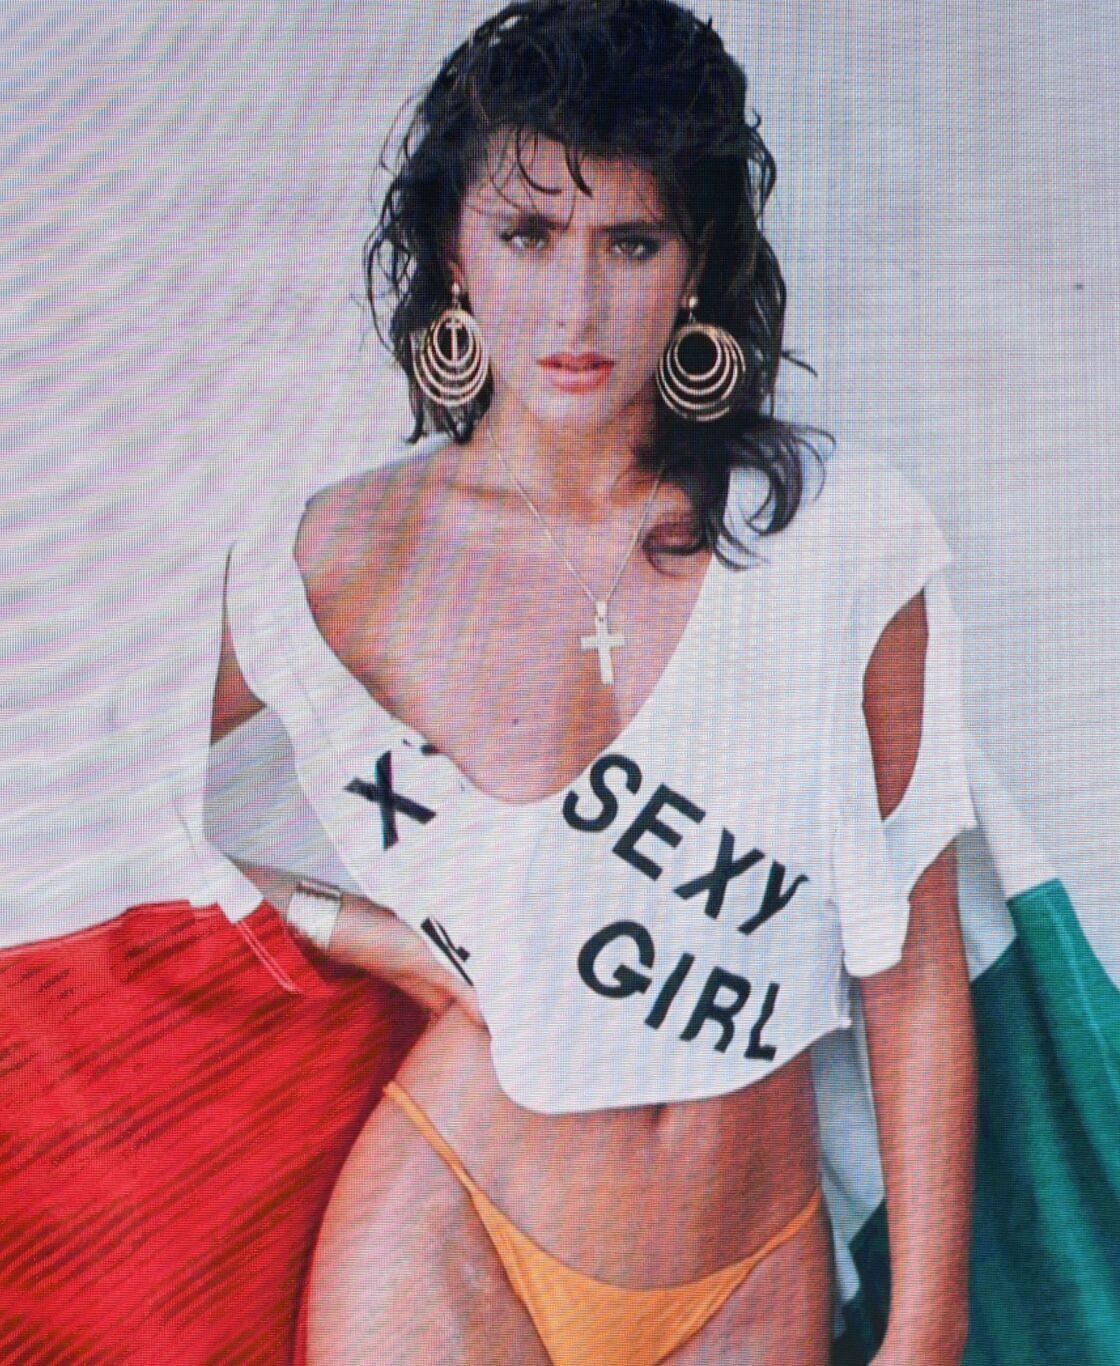 Sabrina Salerno dans les années 1980.